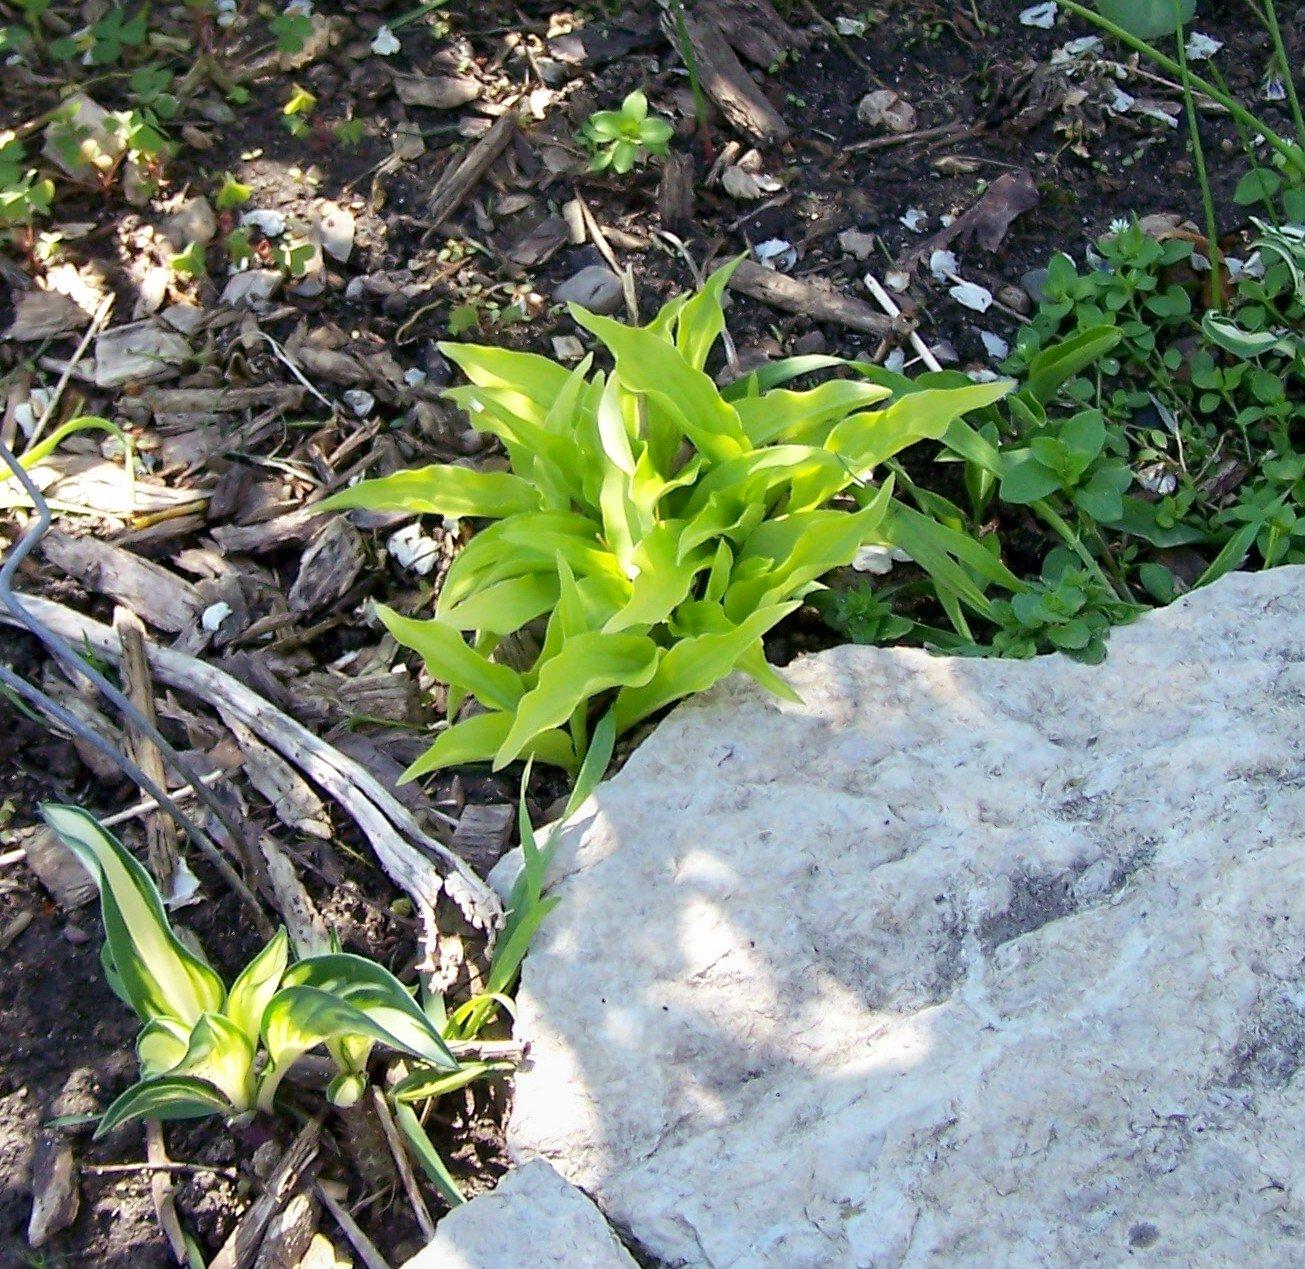 Lemon Lime ( Hosta ) - 1 live plant division ~gemsandstems.info~